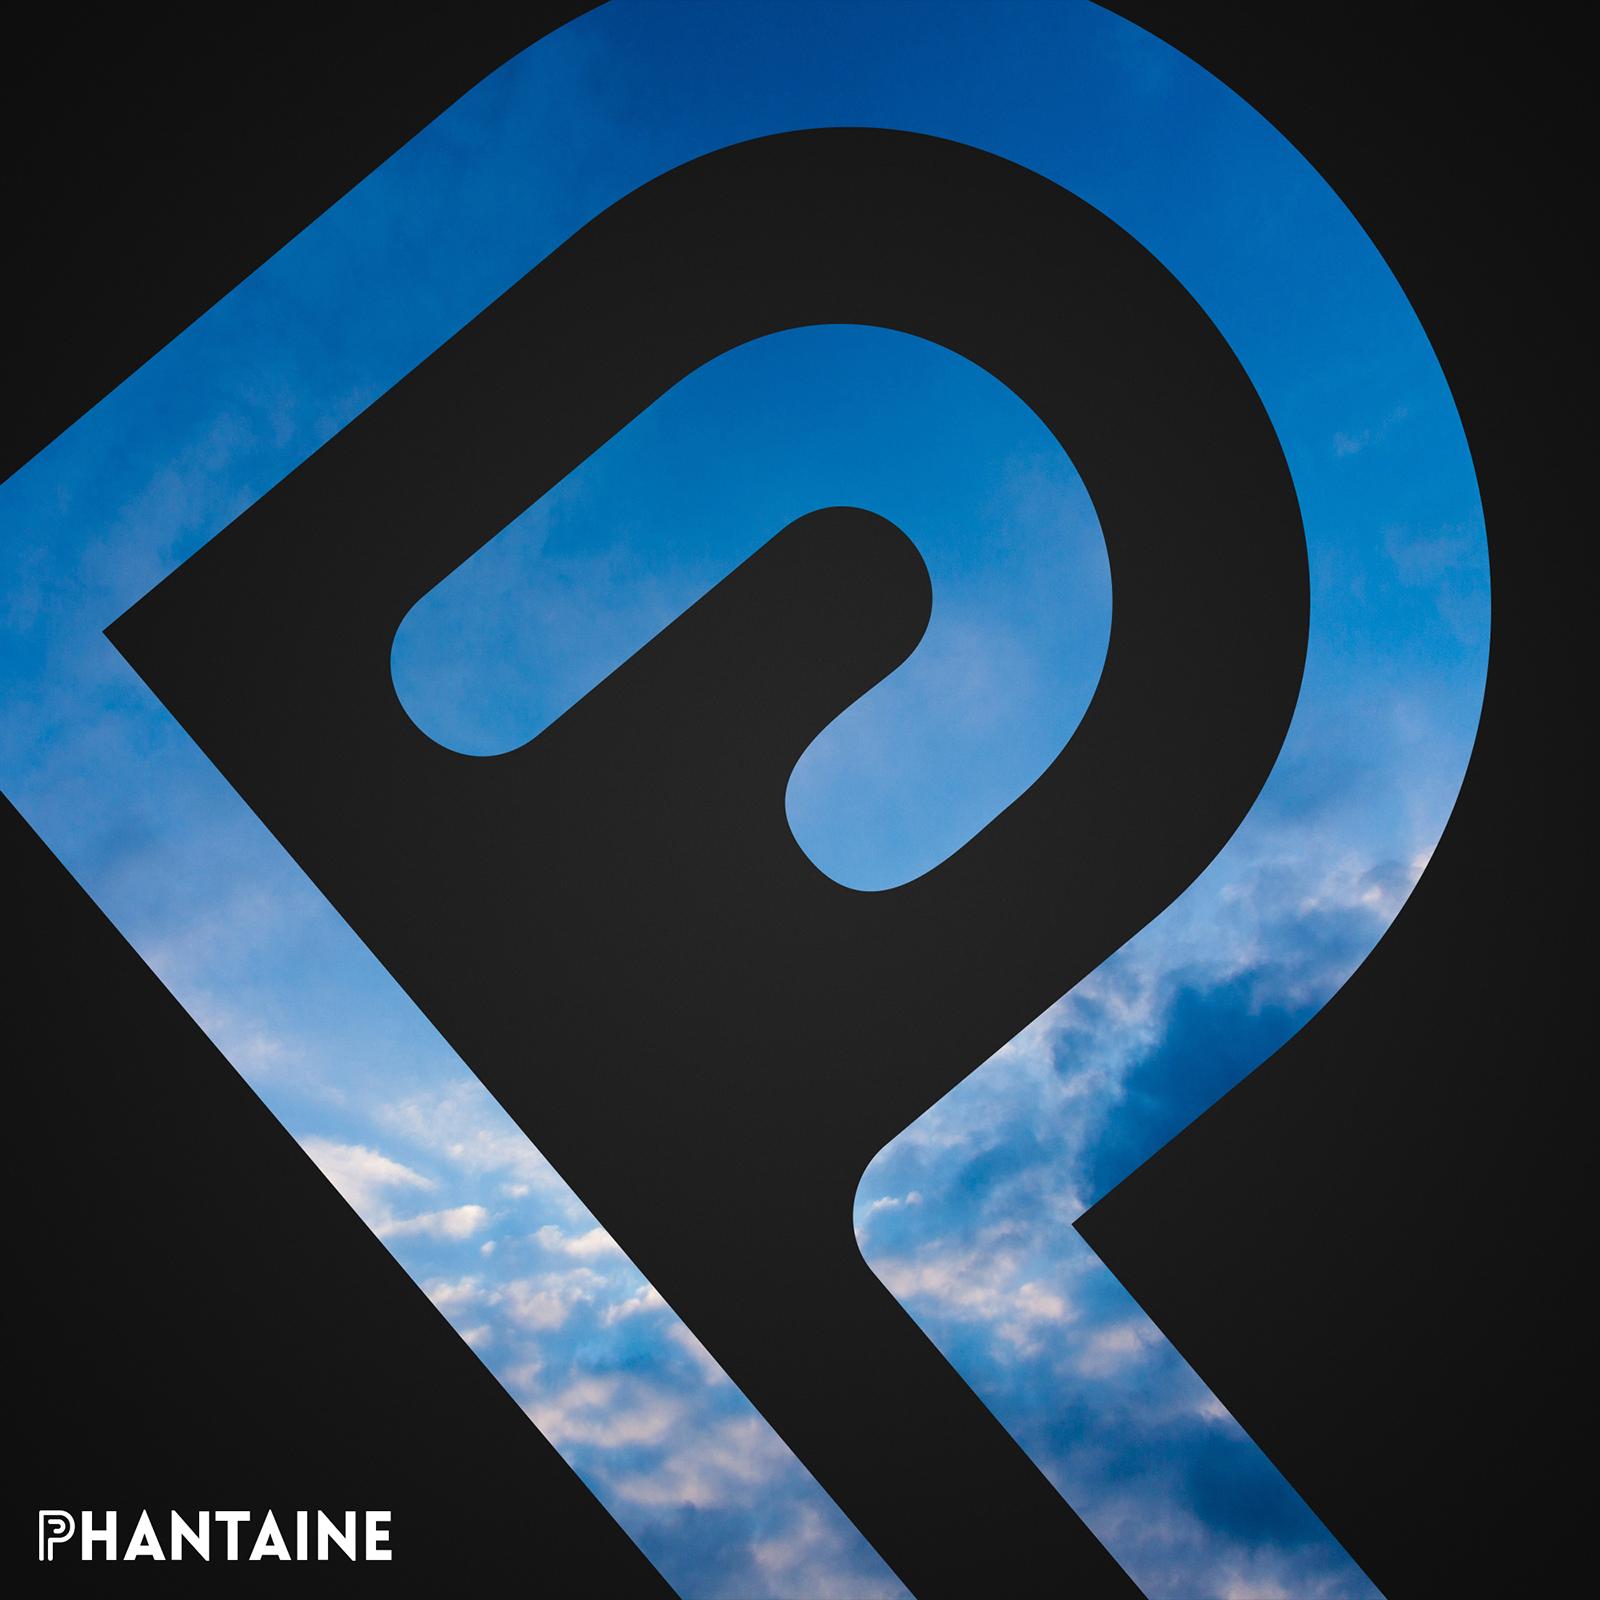 Phantaine Sky (filled P).jpg